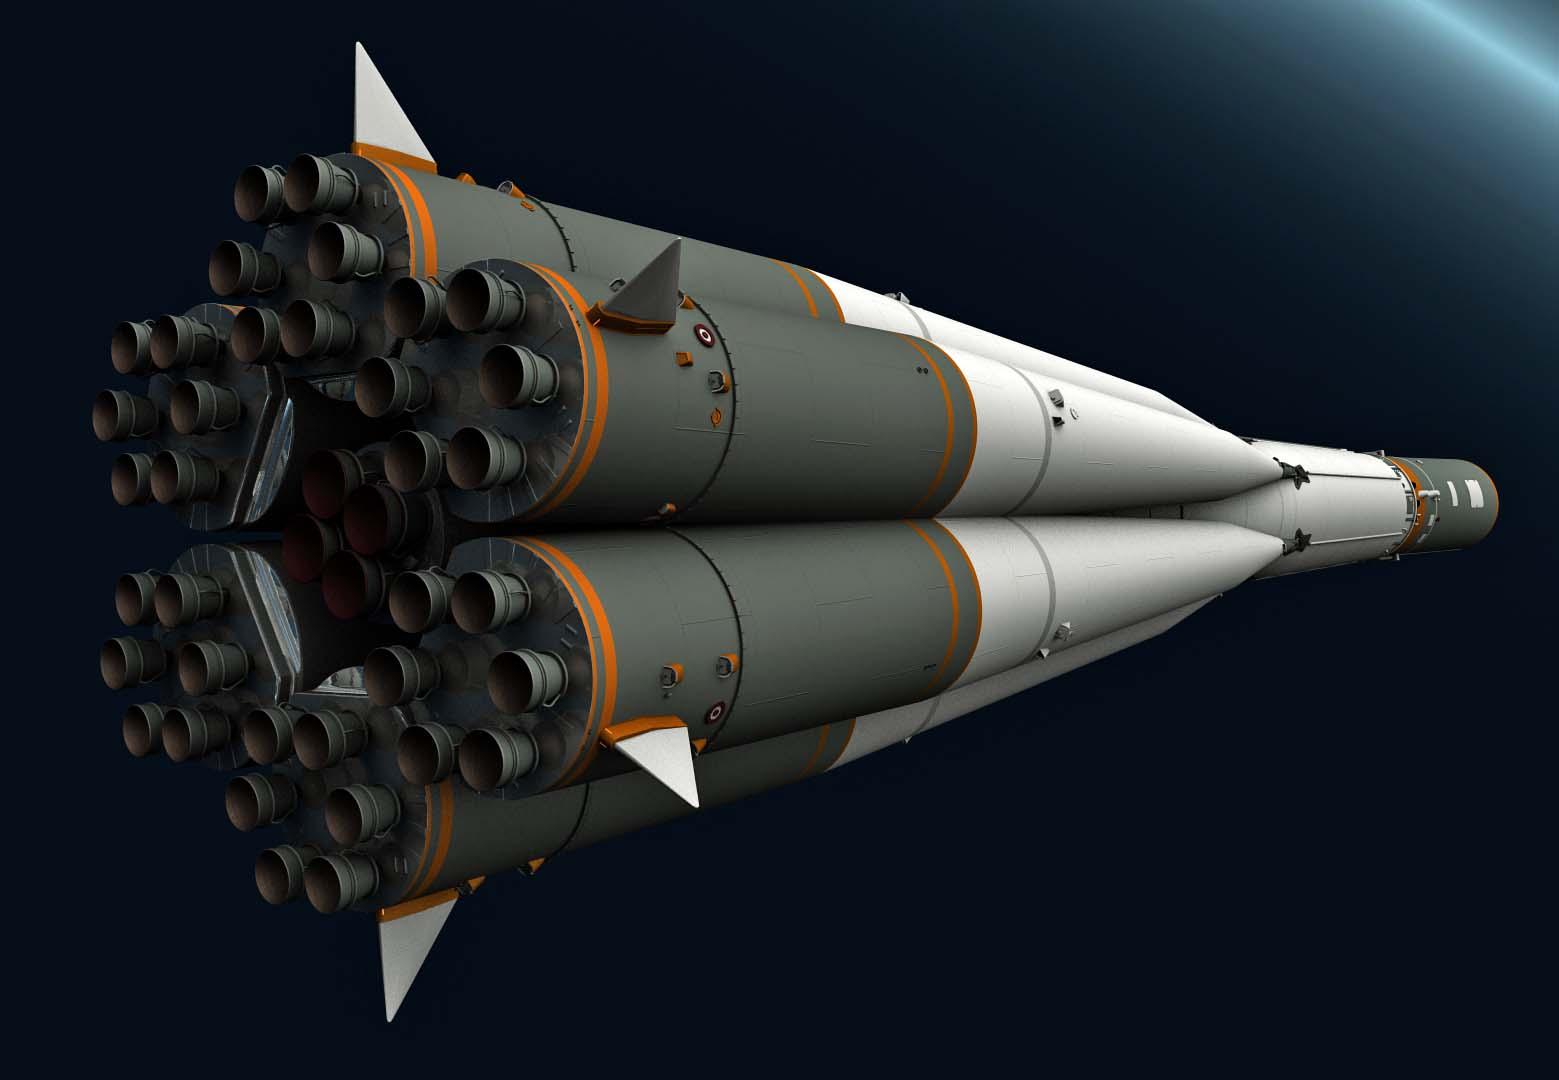 Early kitbash of the Soyuz Yard - Rear